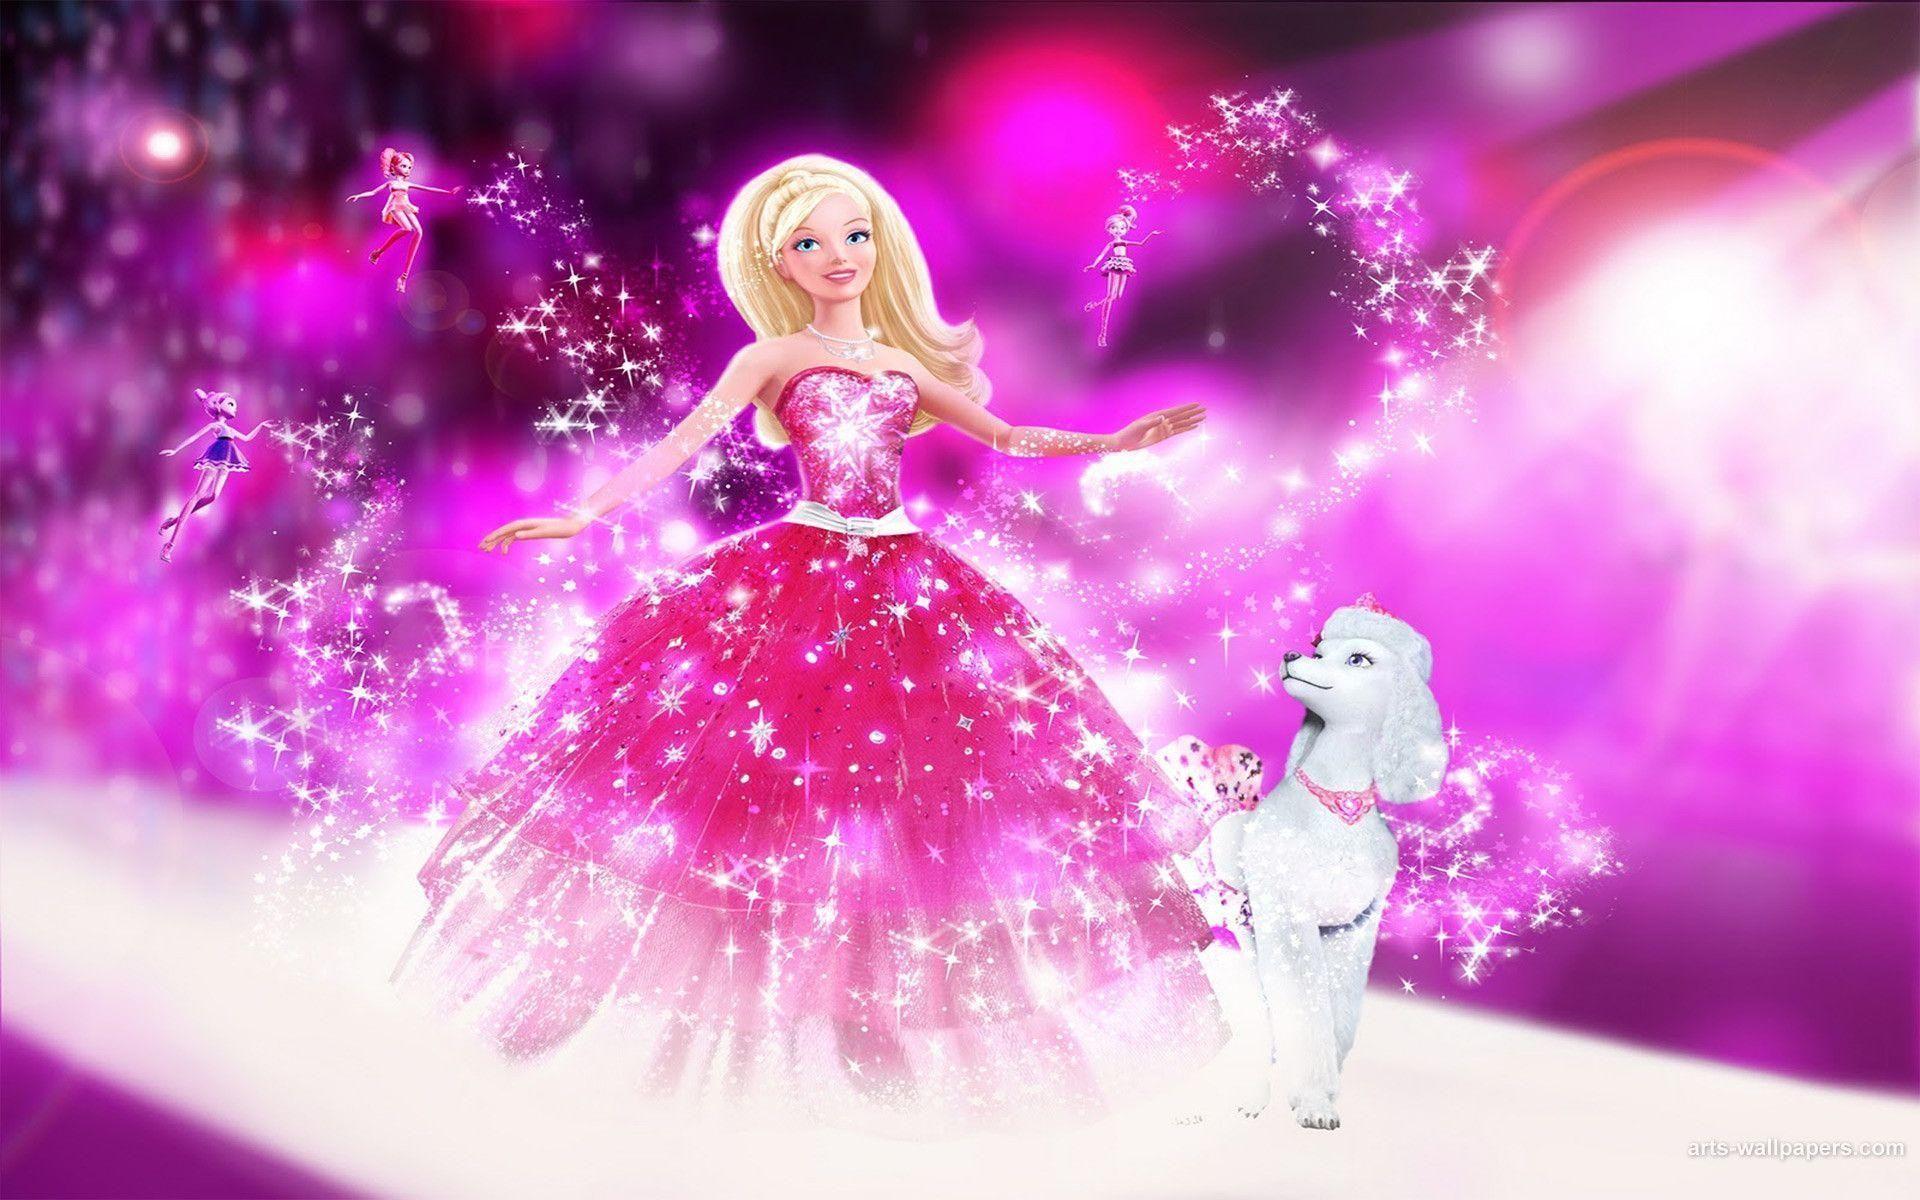 Barbie Hd Wallpapers For Laptop Barbie Movies Barbie Princess Barbie Fashion